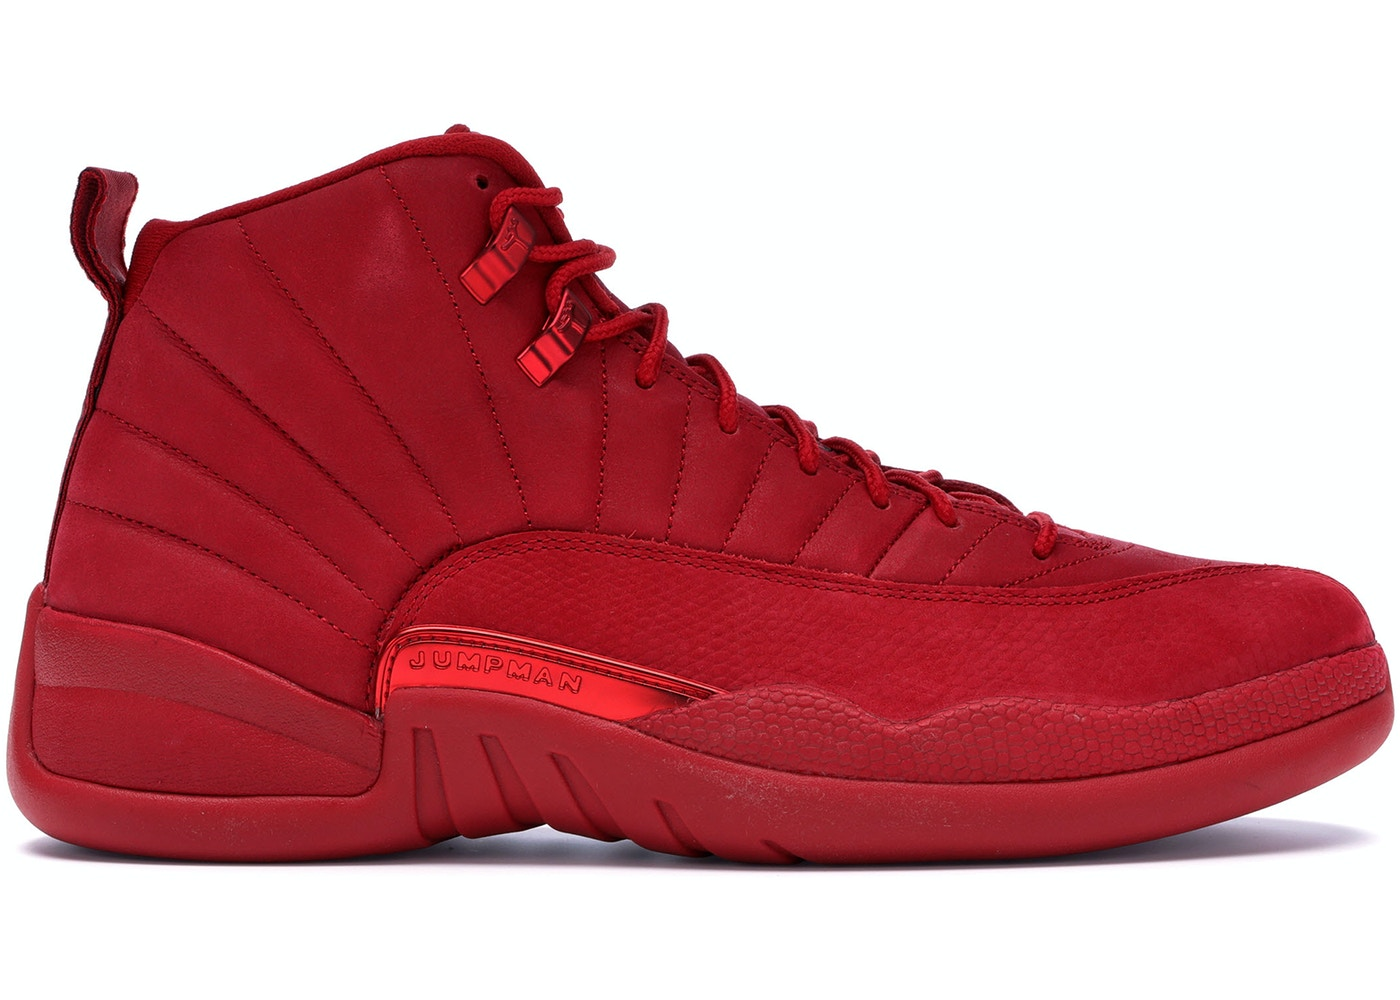 61da6a8b2b0 Buy Air Jordan 12 Shoes   Deadstock Sneakers